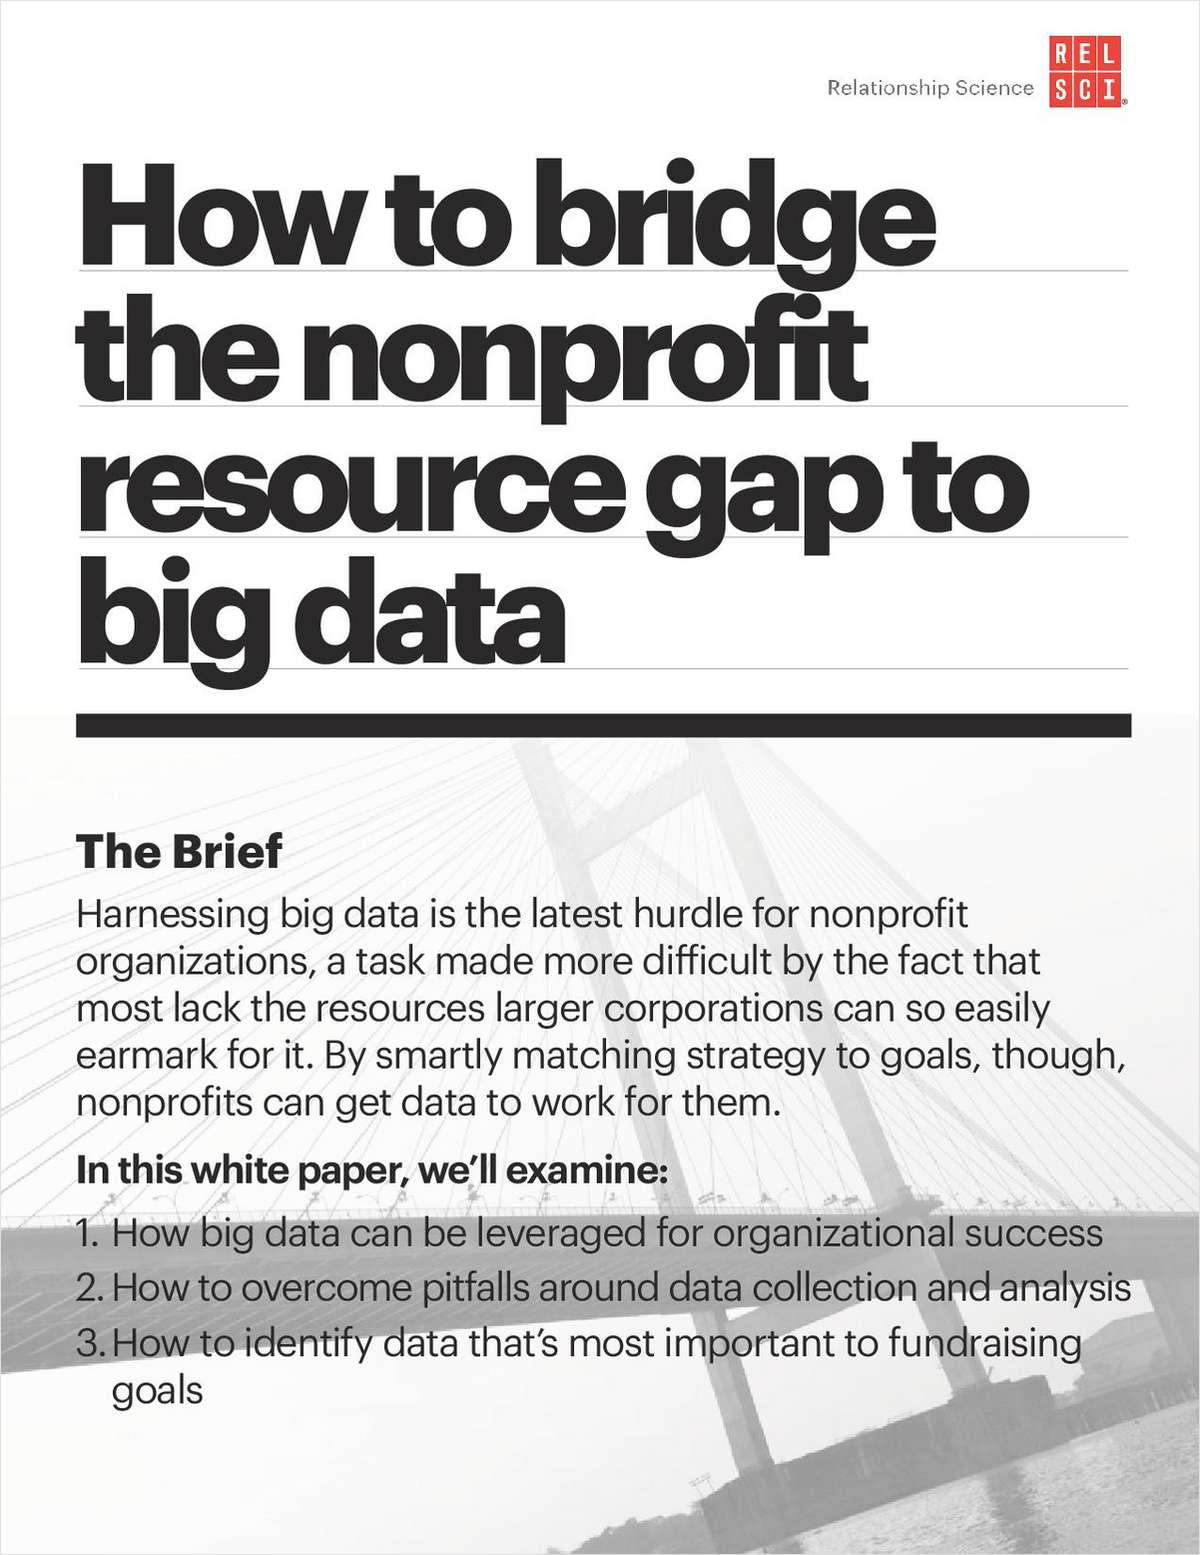 How to Bridge the Nonprofit Resource Gap to Big Data